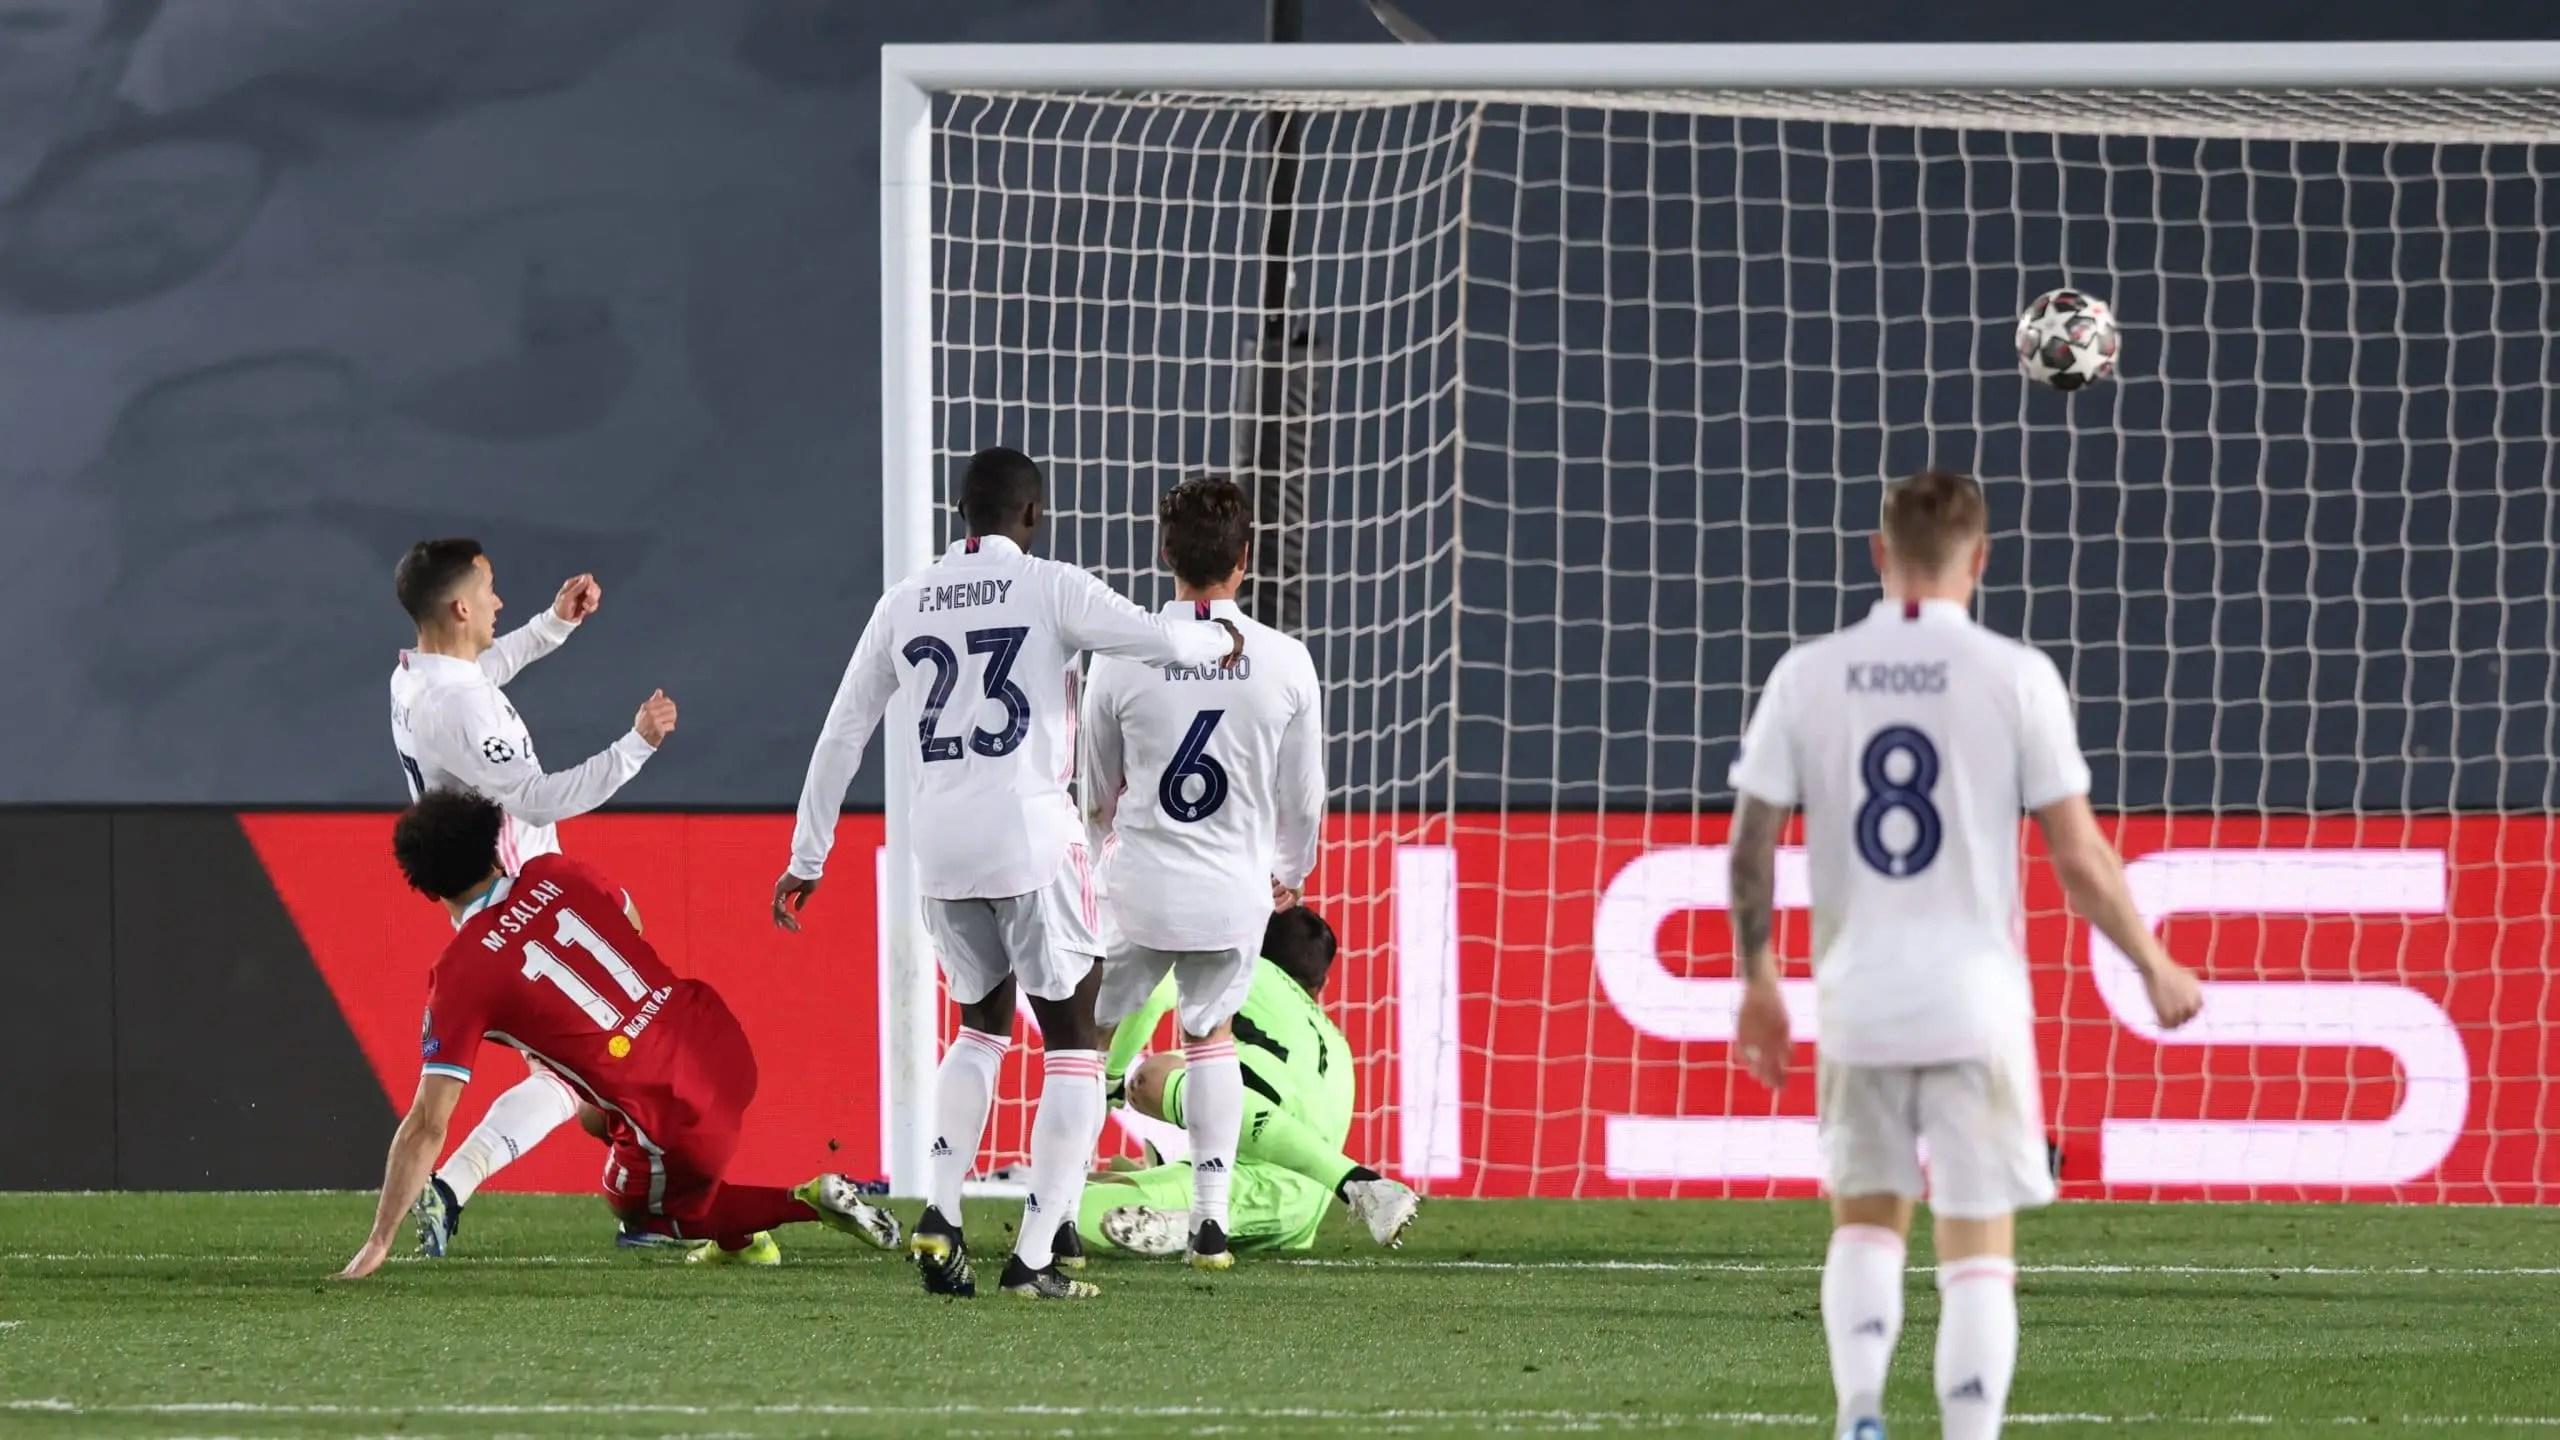 Carragher Slams 'Poor' Liverpool Display Vs Real Madrid